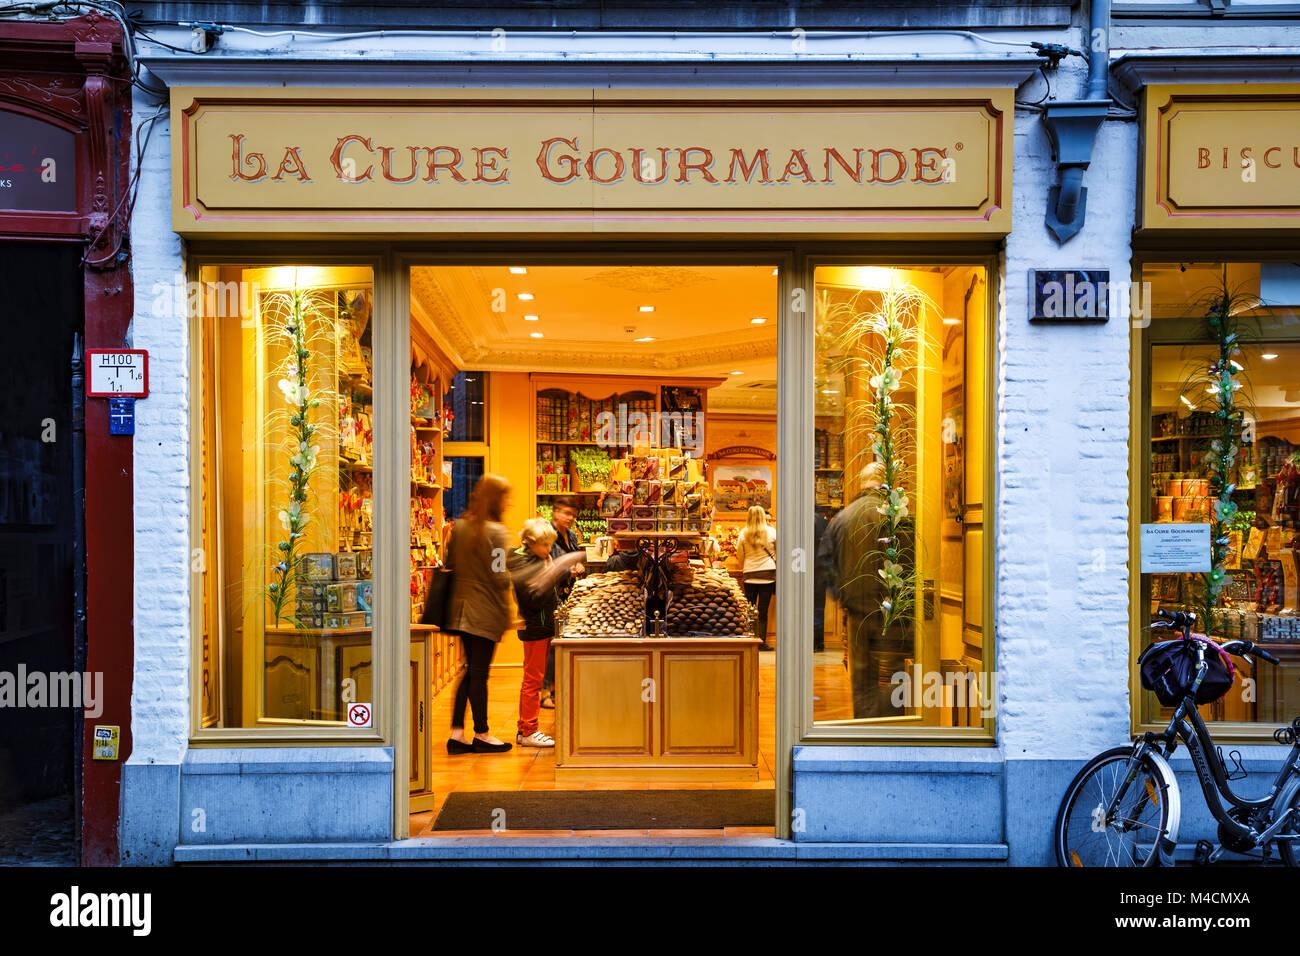 La Cure Gourmande Candy Store, Brügge, Belgien Stockbild